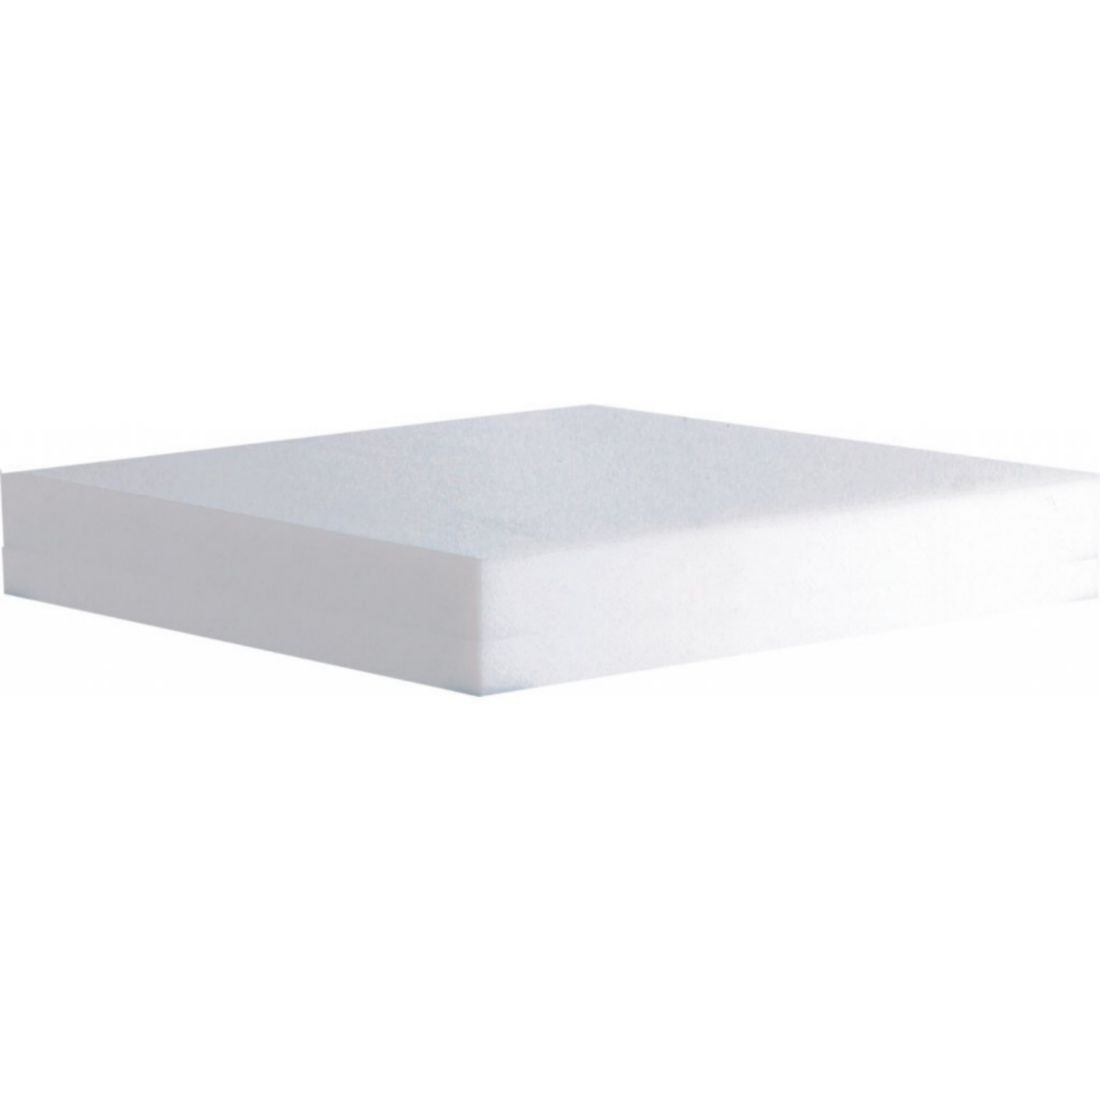 Blok porcovací polyetylen 50x40 cm, výška 5 cm